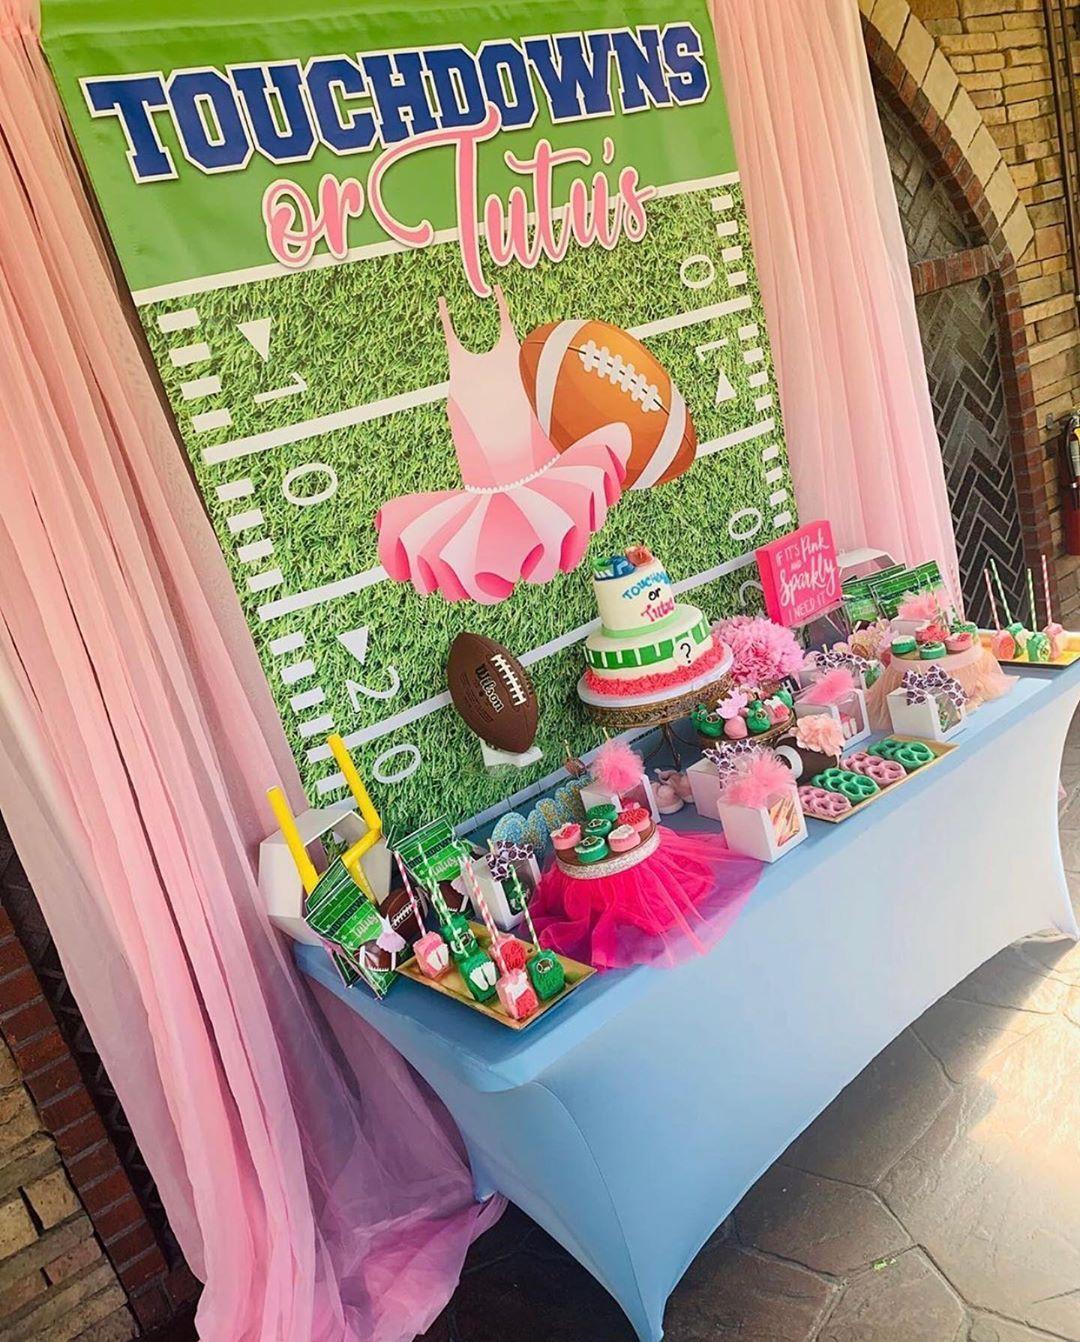 Woo Em On Instagram Touchdowns Or Tutus Gender Reveal Kandk Sweetevents Inquiri Tutus Gender Reveal Gender Reveal Party Theme Gender Reveal Party Games